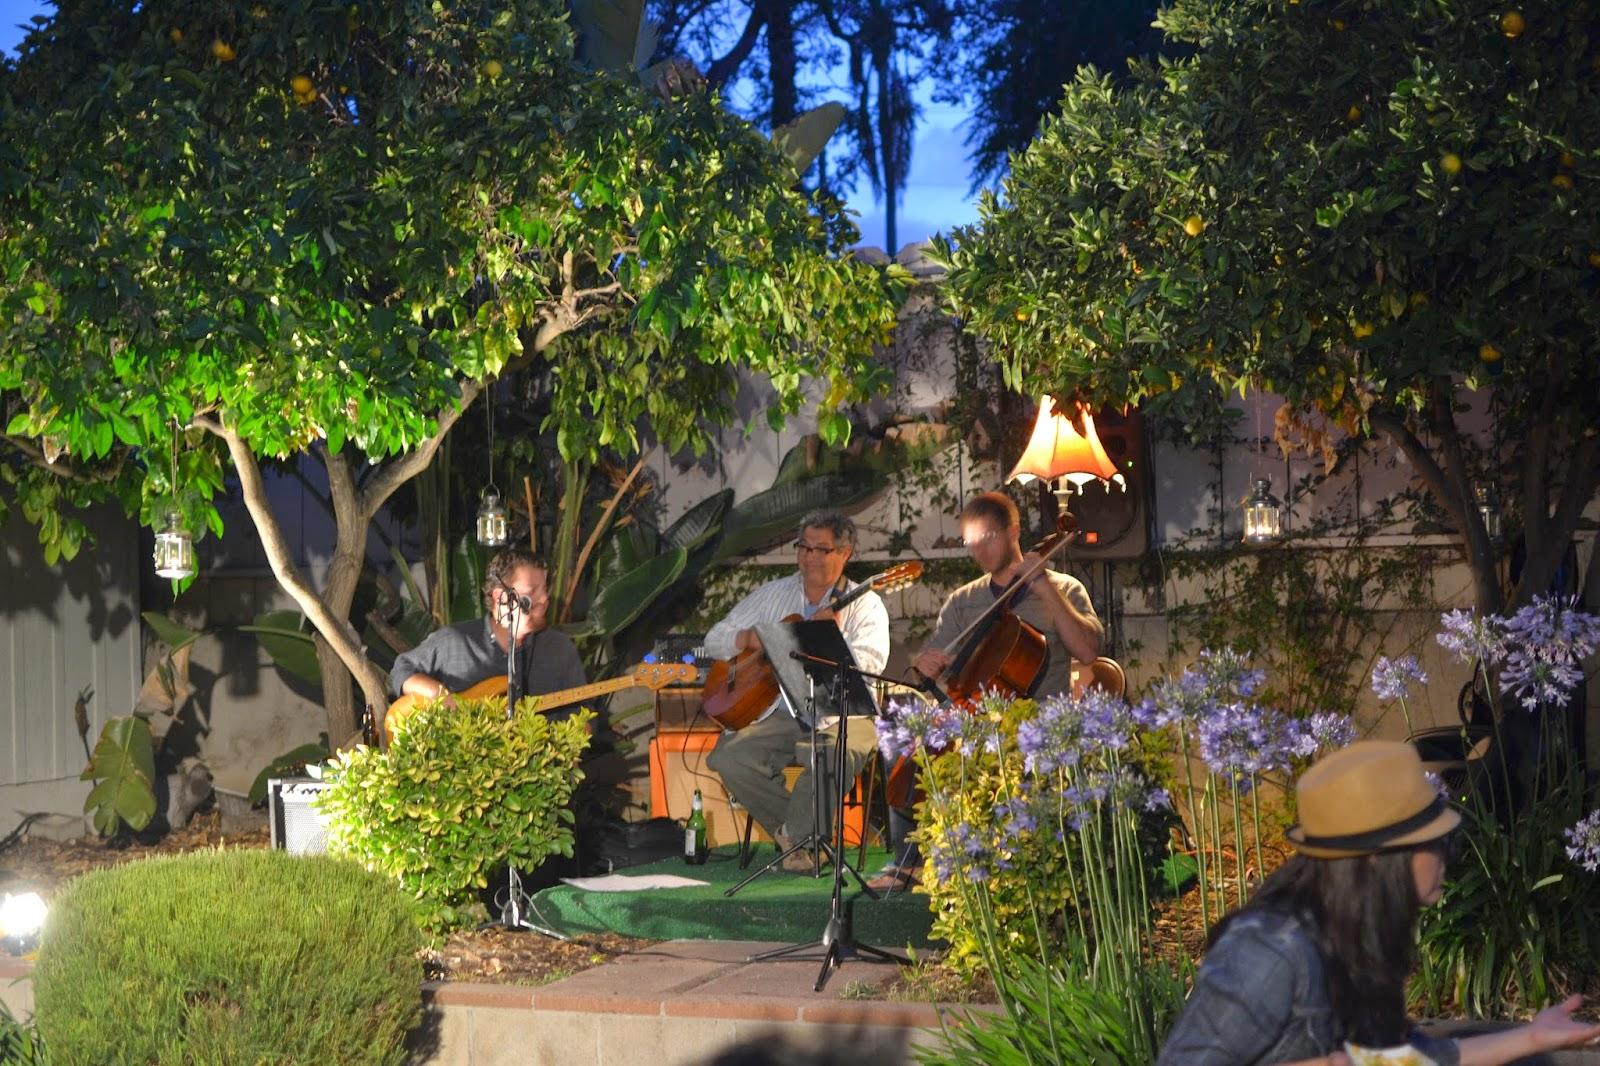 mcbride links 2014 backyard concert series